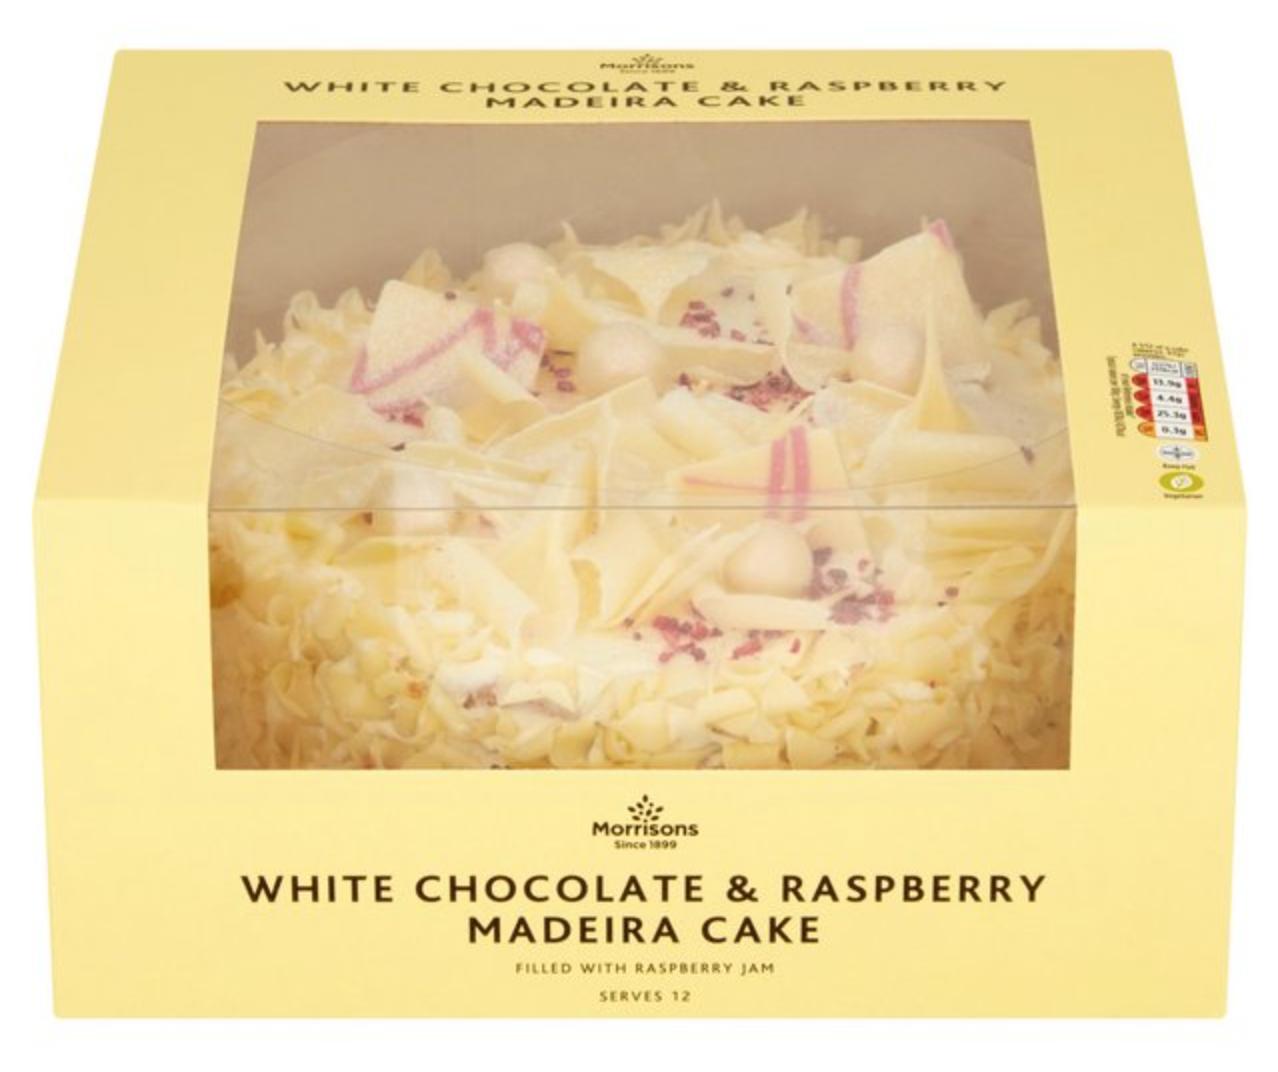 MORRISONS white chocolate and raspberry cake